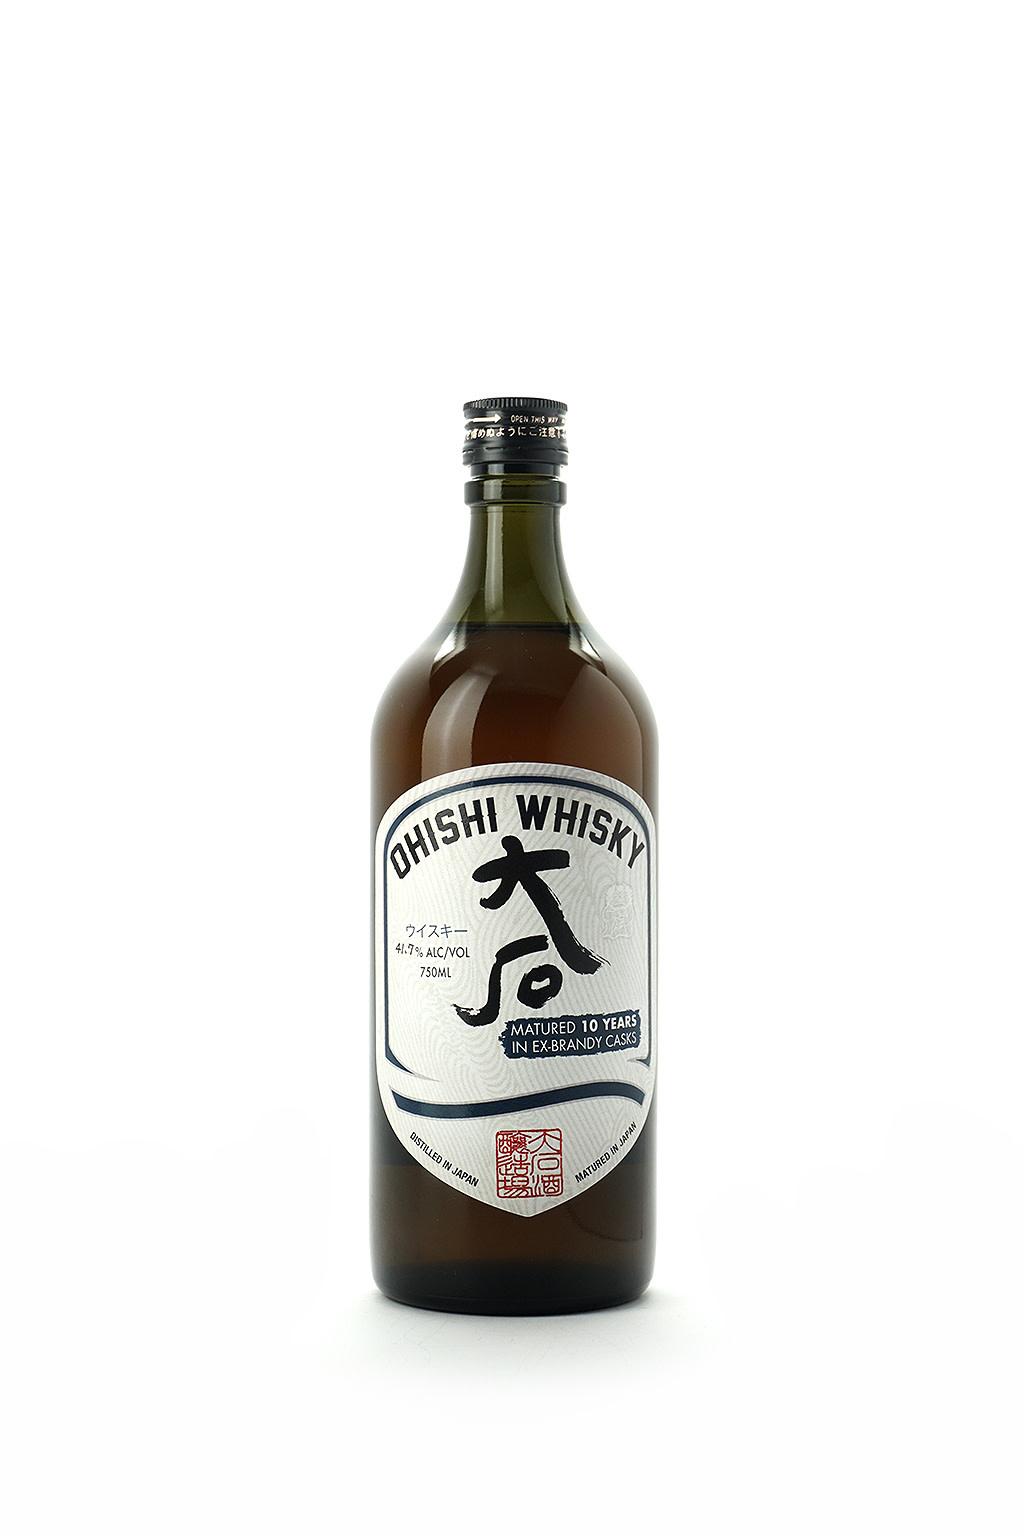 Ohishi Brandy Cask Whisky 10 Year